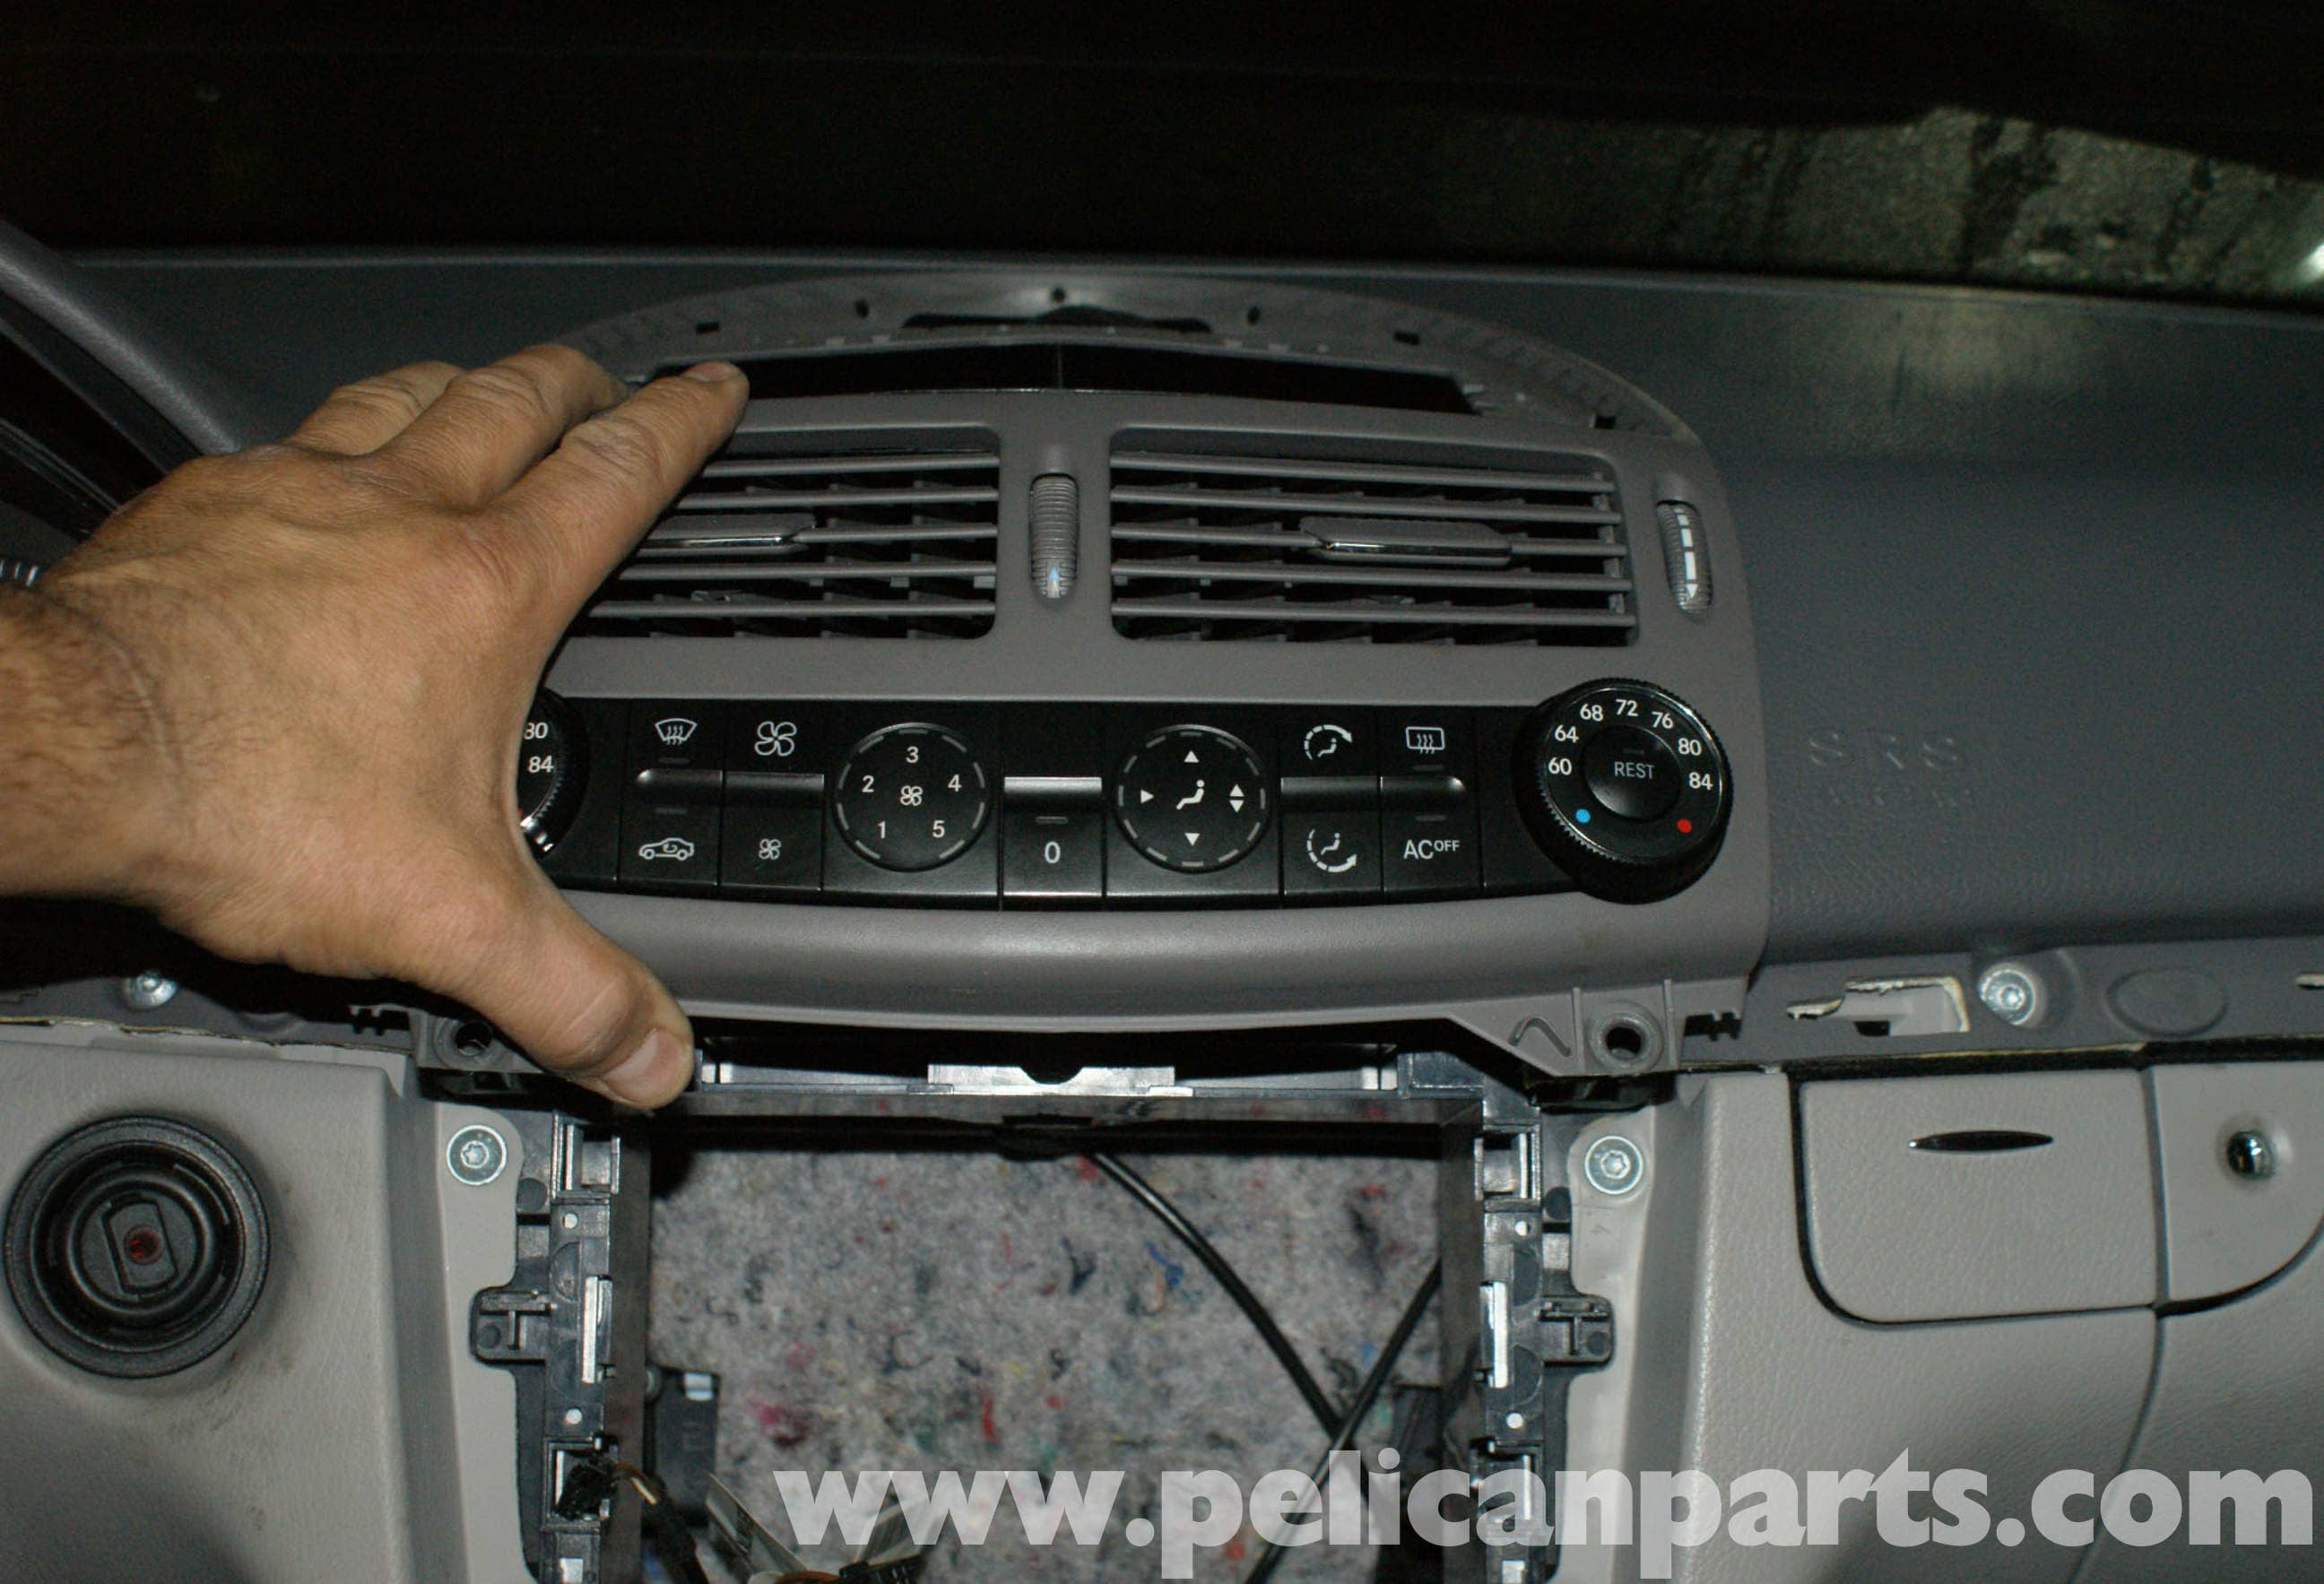 Mercedes-Benz W211 Climate Control Unit Replacement (2003-2009) E320